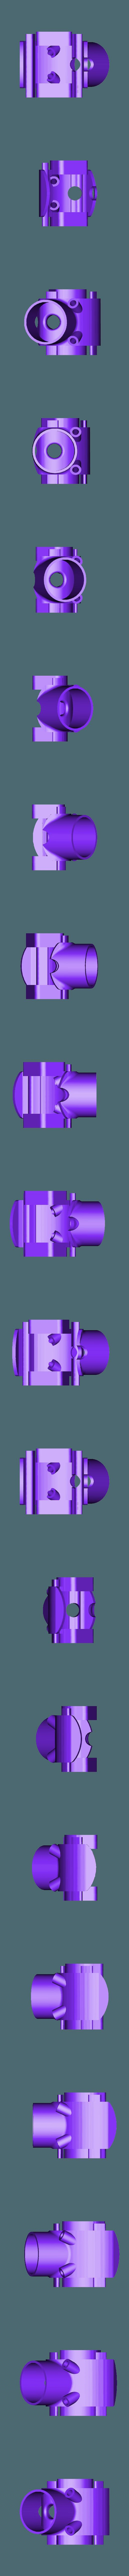 GepRC_CX2_Antenna_Mount_%2B_VTX_Lollipop_3.stl Download free STL file GEPRC CX2/CX3 (Cinepro 4K, Cineking, CineQueen) - Various Antenna Mounts and VTX • 3D printer design, rodrigosclosa